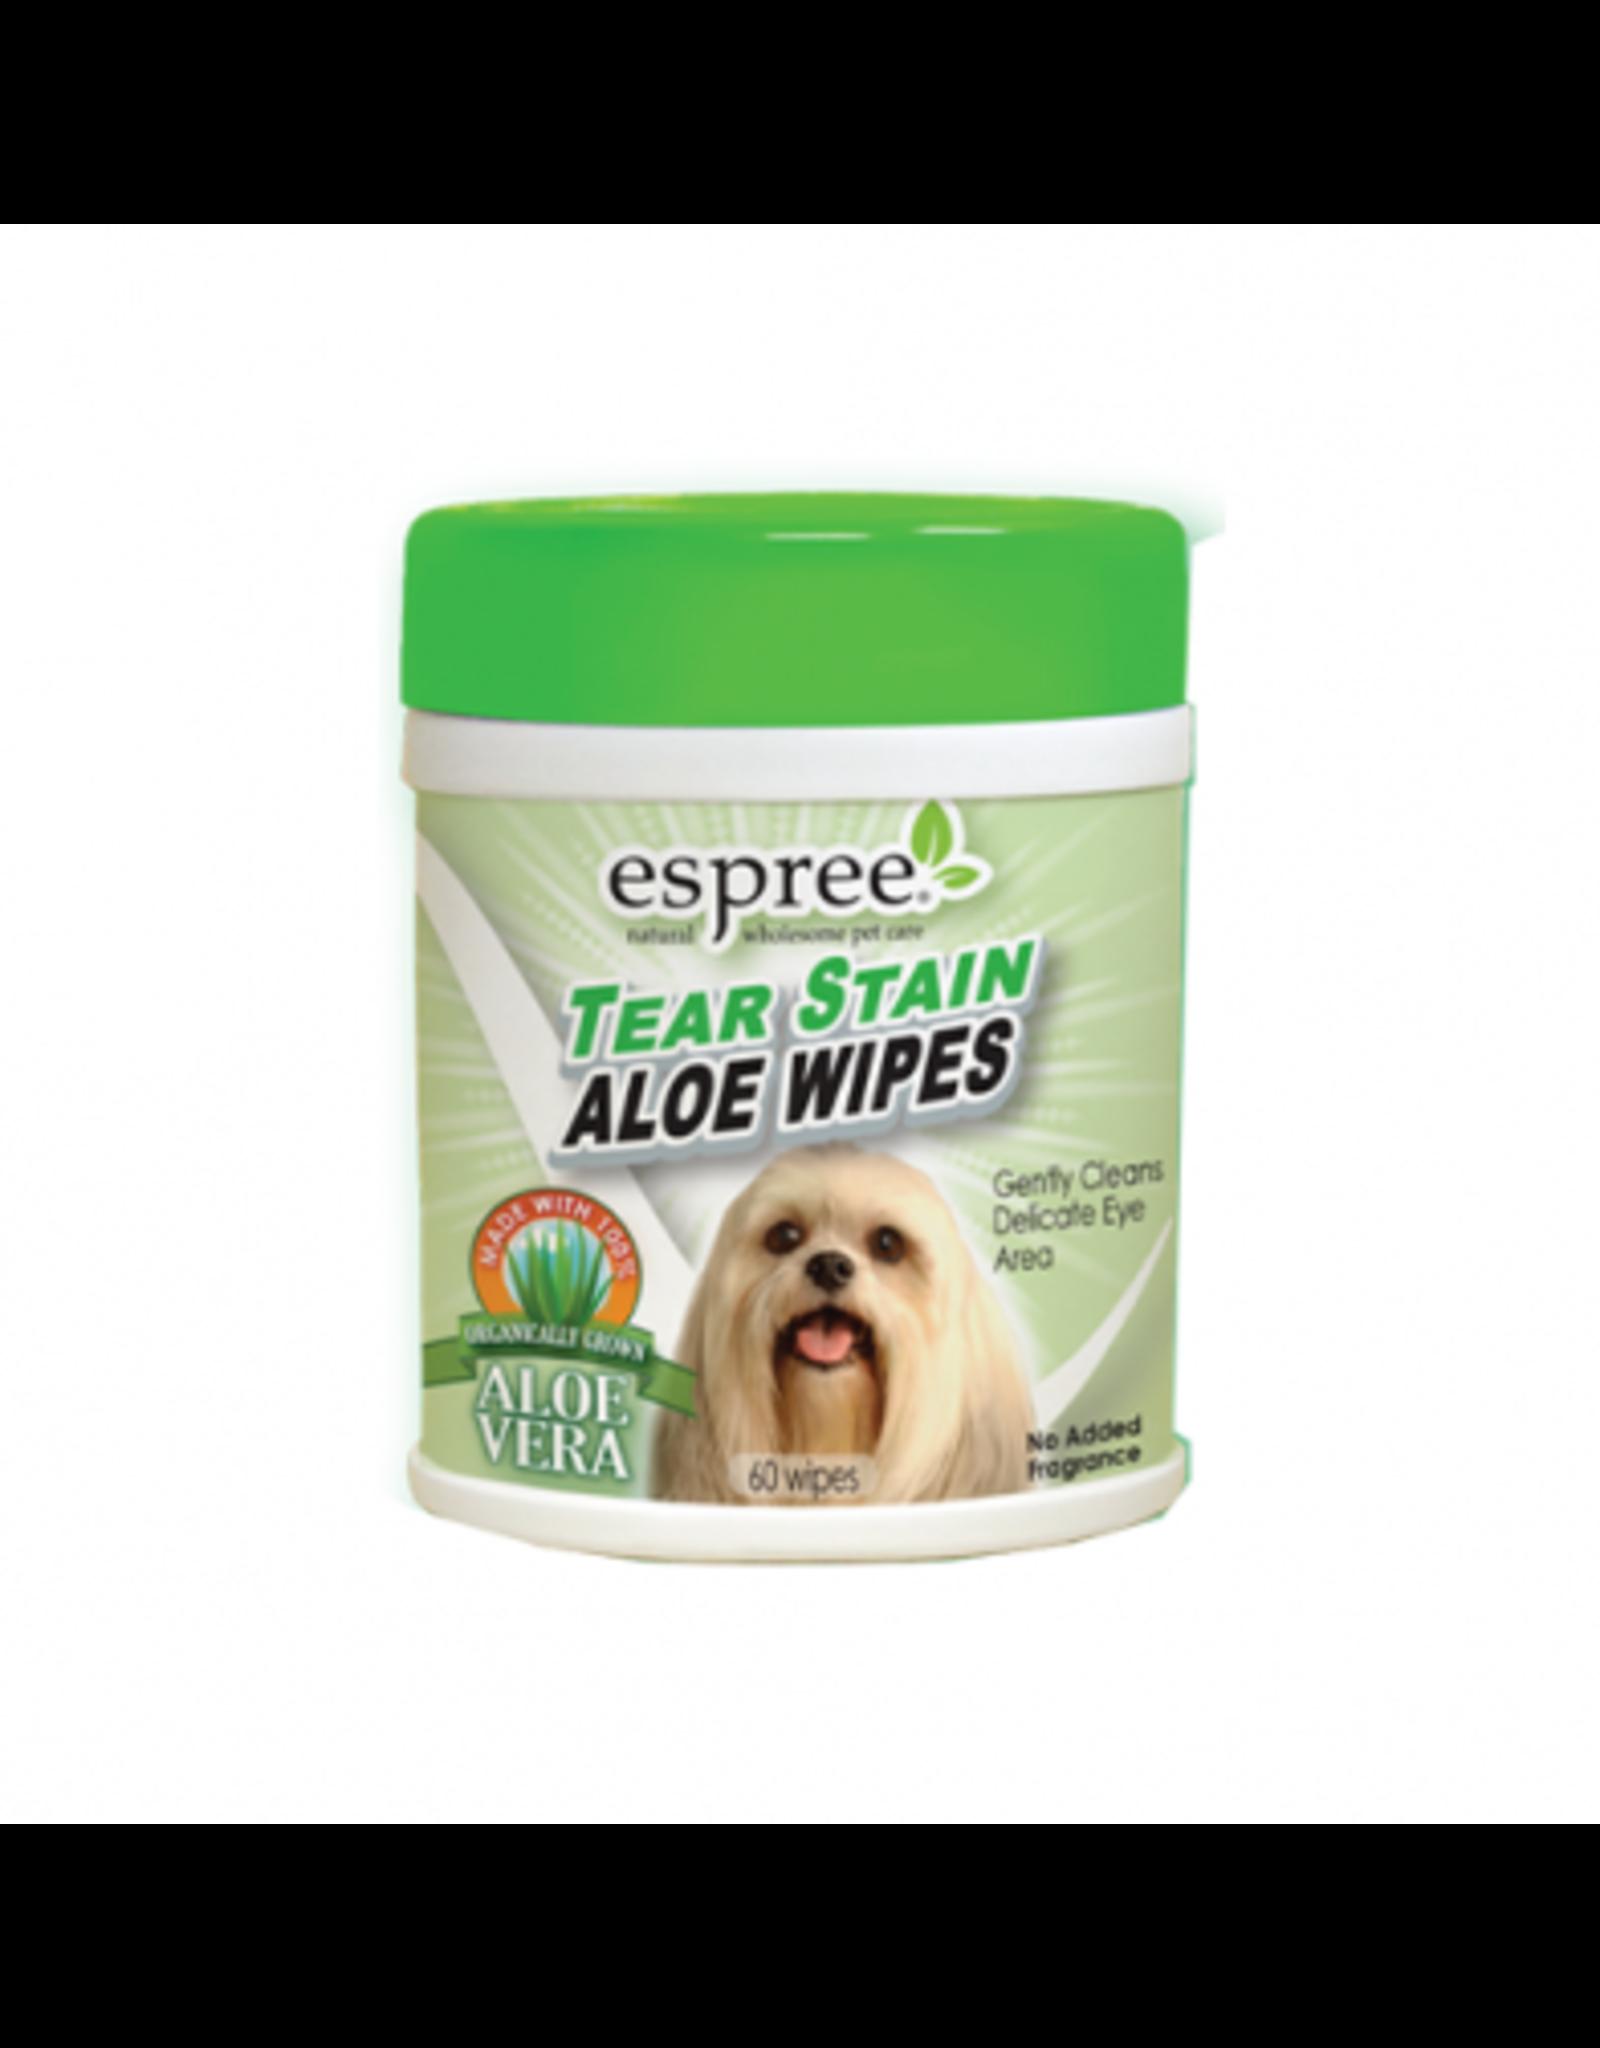 Espree Espree Tear Stain Aloe Wipes for Dogs